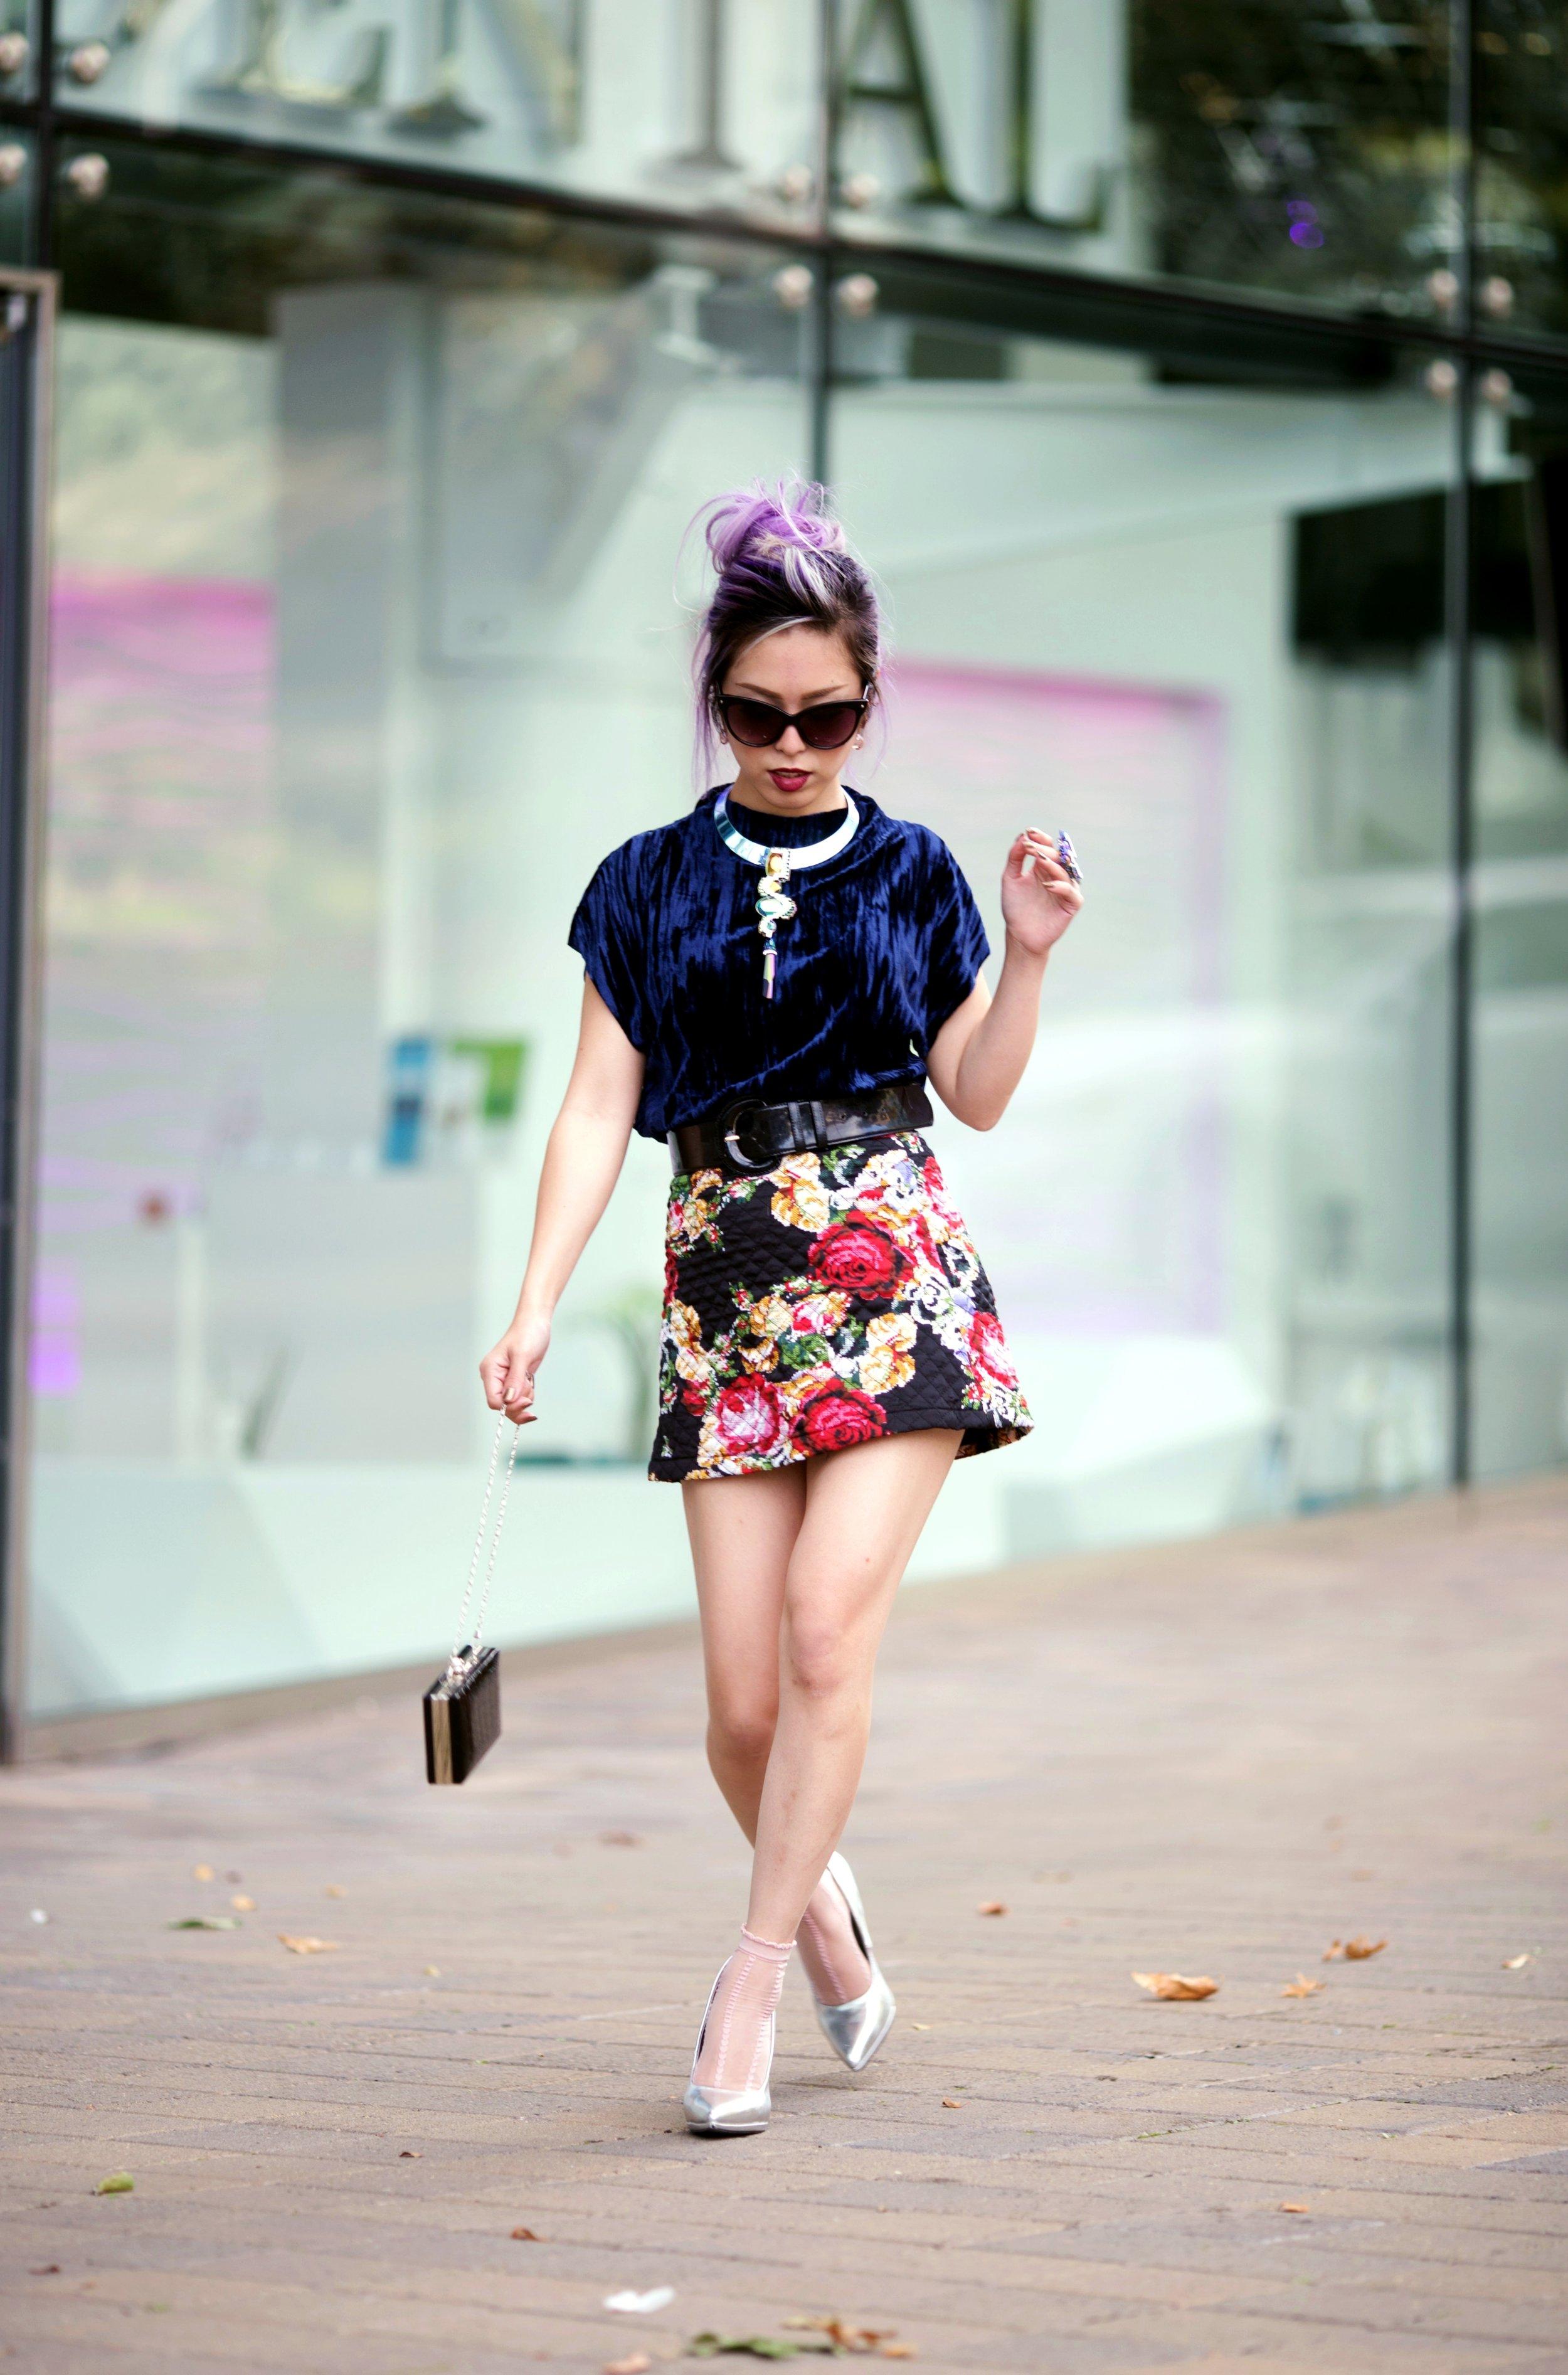 ZARA Blue Velvet Top_Forever 21 Floral Print Mini Skirt_Mango Patent Belt_Kate Spade Sheer Ankle Socks_Qupid Silver Pumps_Aldo Cateye Sunglasses_Swarovski Fluorescent Necklace & Fluorescent Ring_Aika's Love Closet_Seattle Fashion Blogger_Japanese_Lavender Hair_Mermaid Hair 7